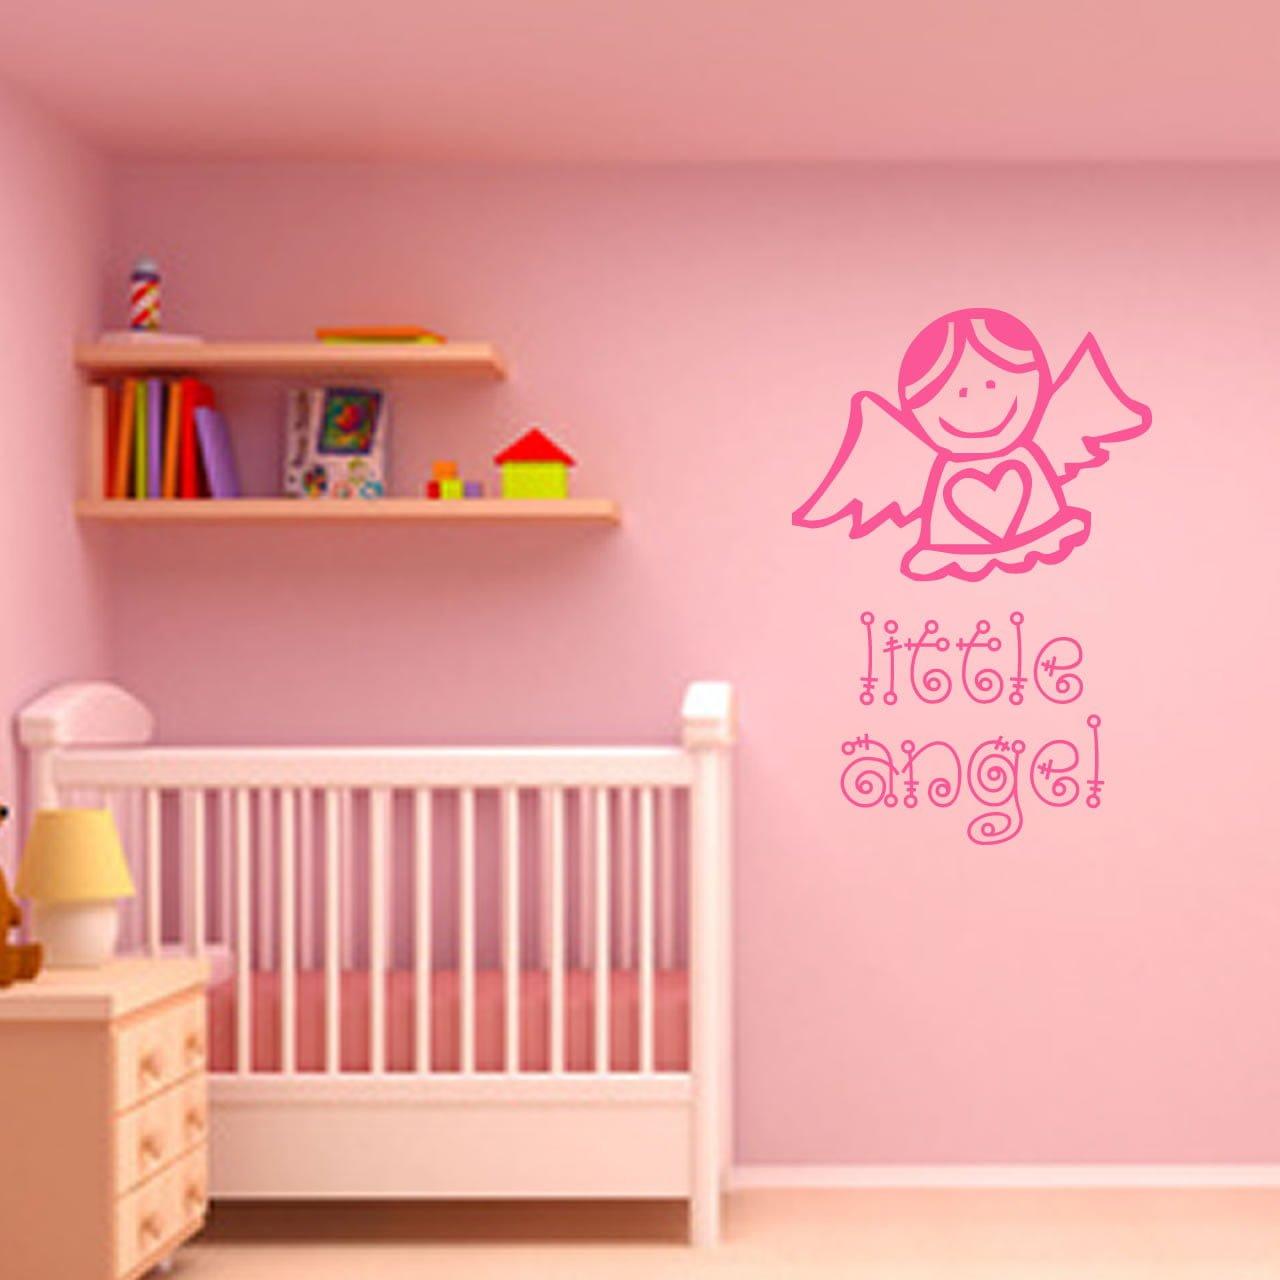 Little angel childrens wall sticker world of wall stickers little angel childrens wall sticker decal a amipublicfo Gallery